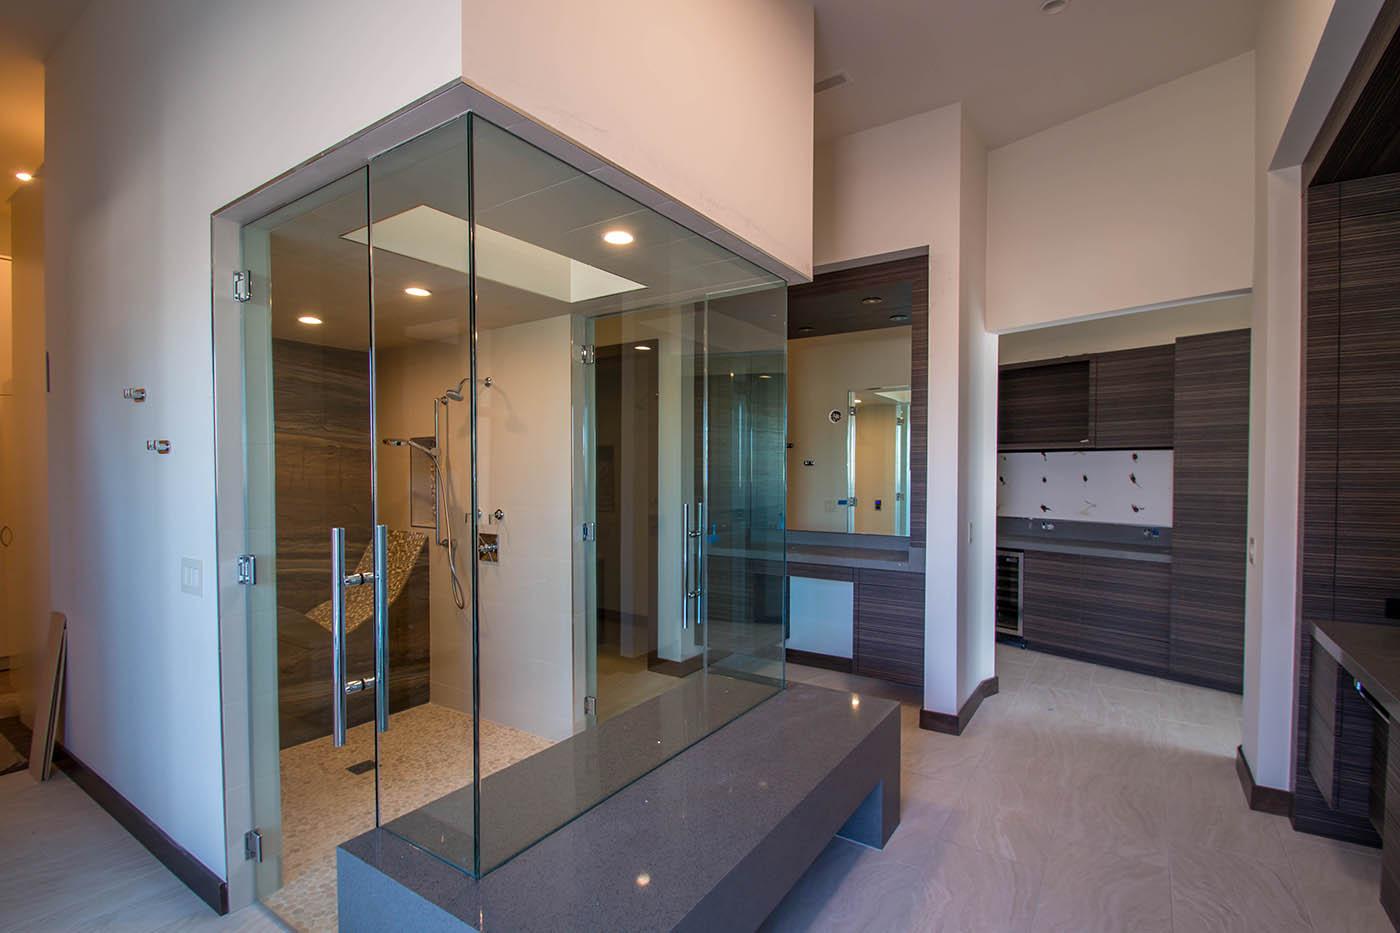 Boulderback Sunwest Custom Home Project | A Cutting Edge Glass & Mirror